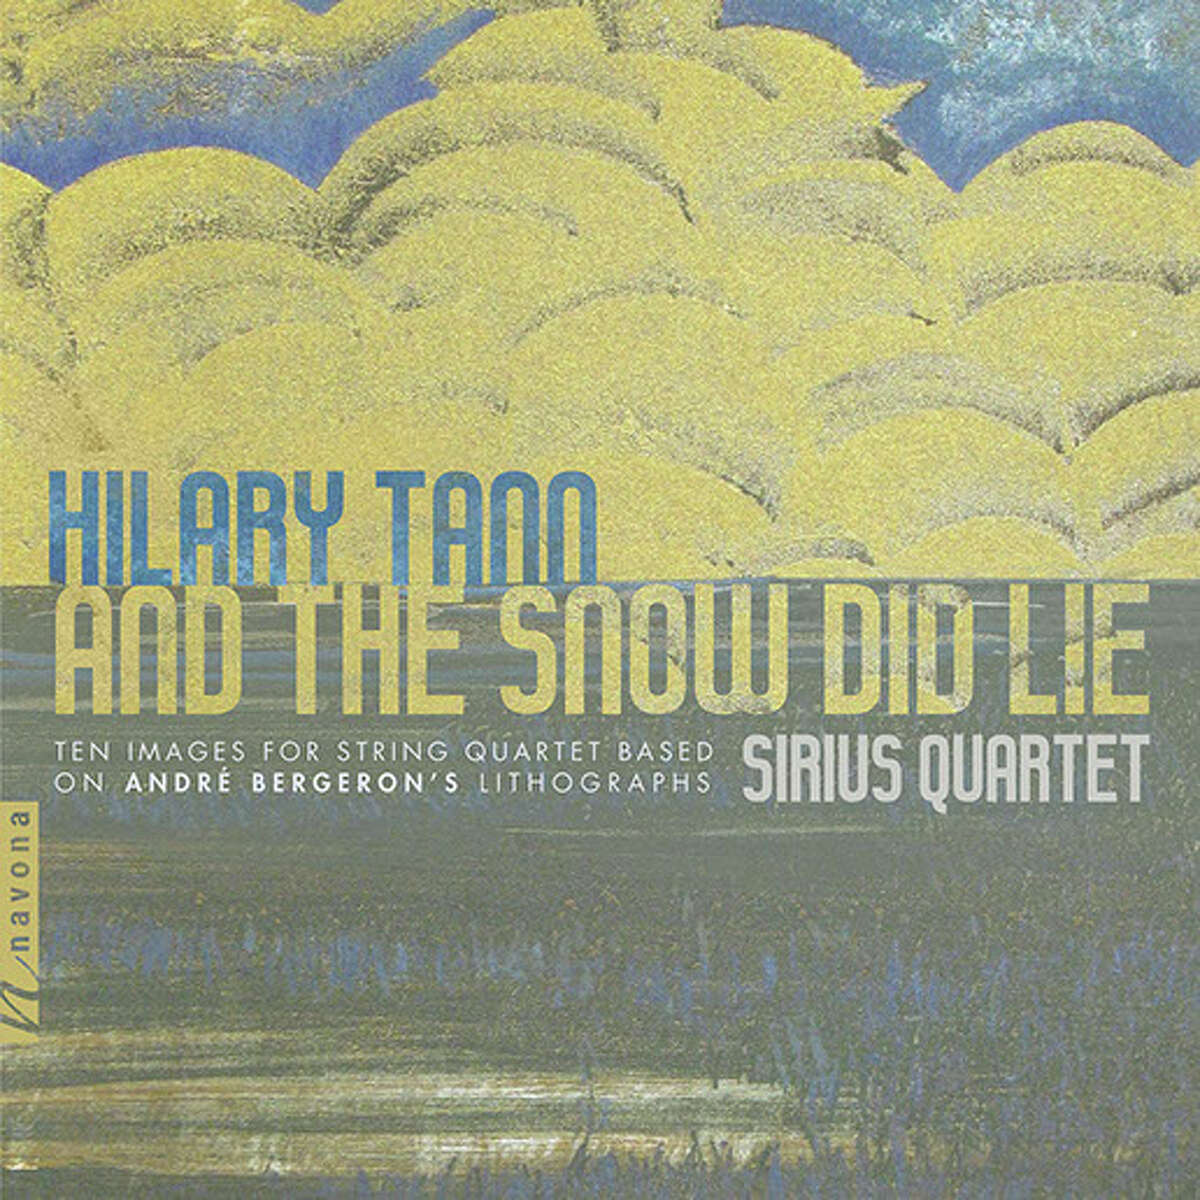 """And the Snow Did Lie"" - Hilary Tann"